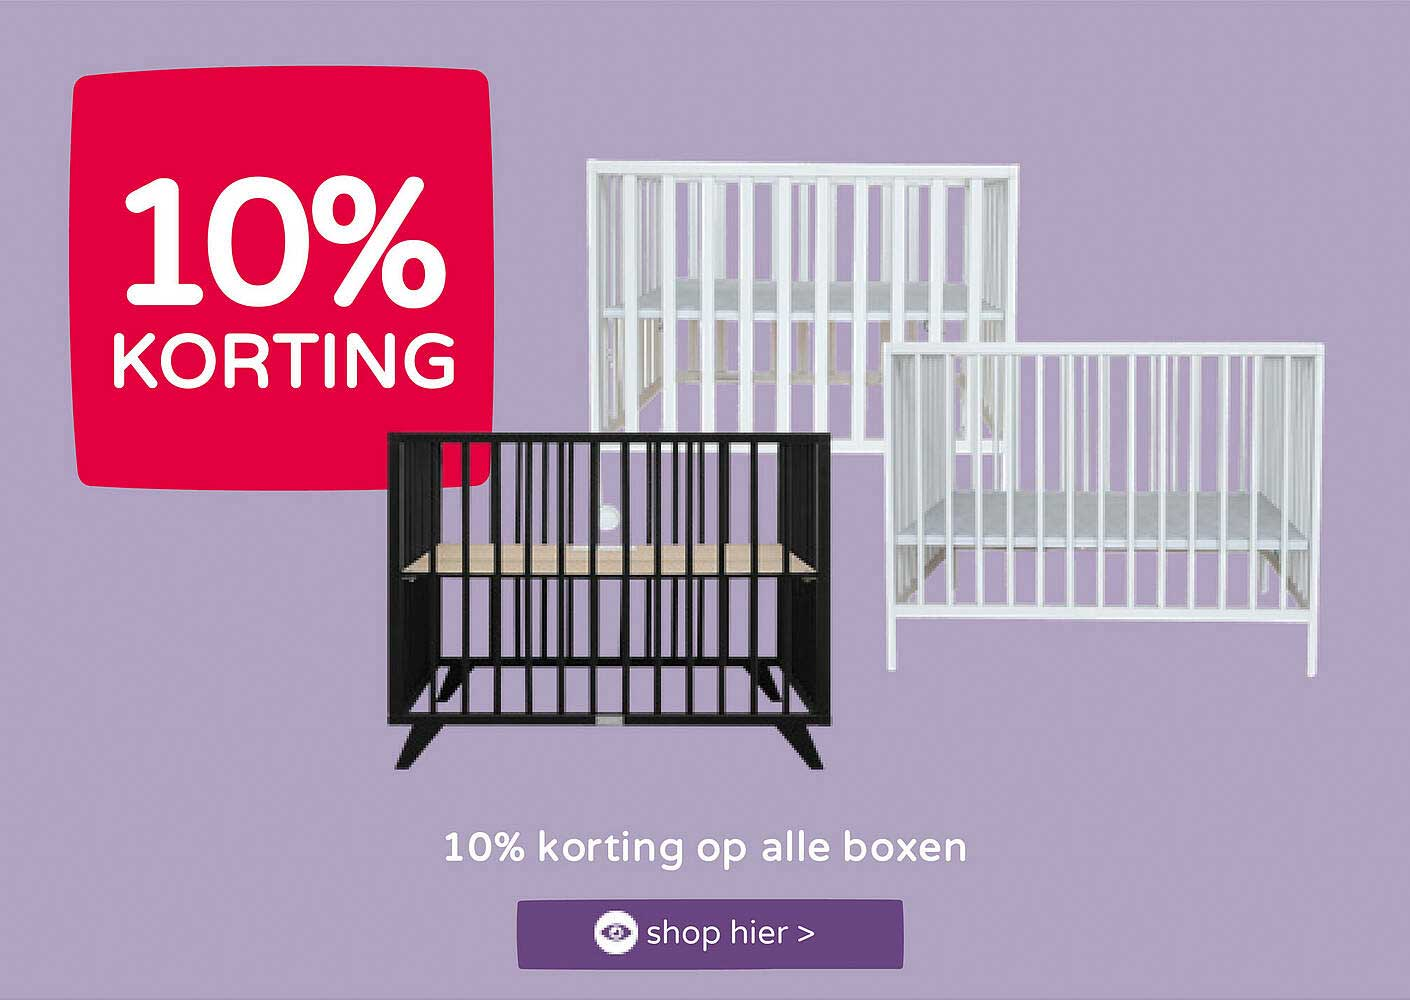 Prénatal 10% Korting Op Alle Boxen